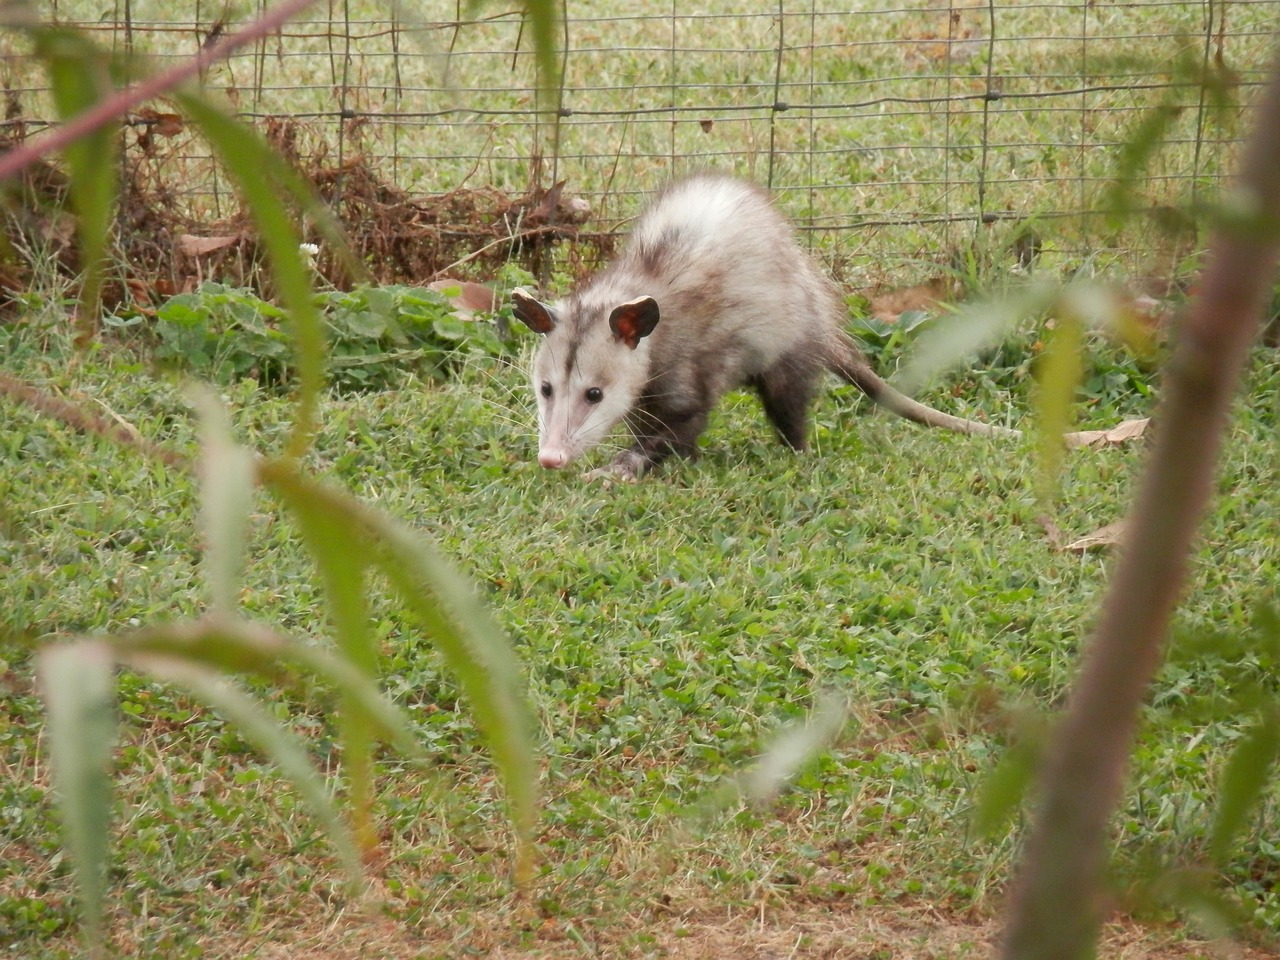 Do Possums Eat Chickens